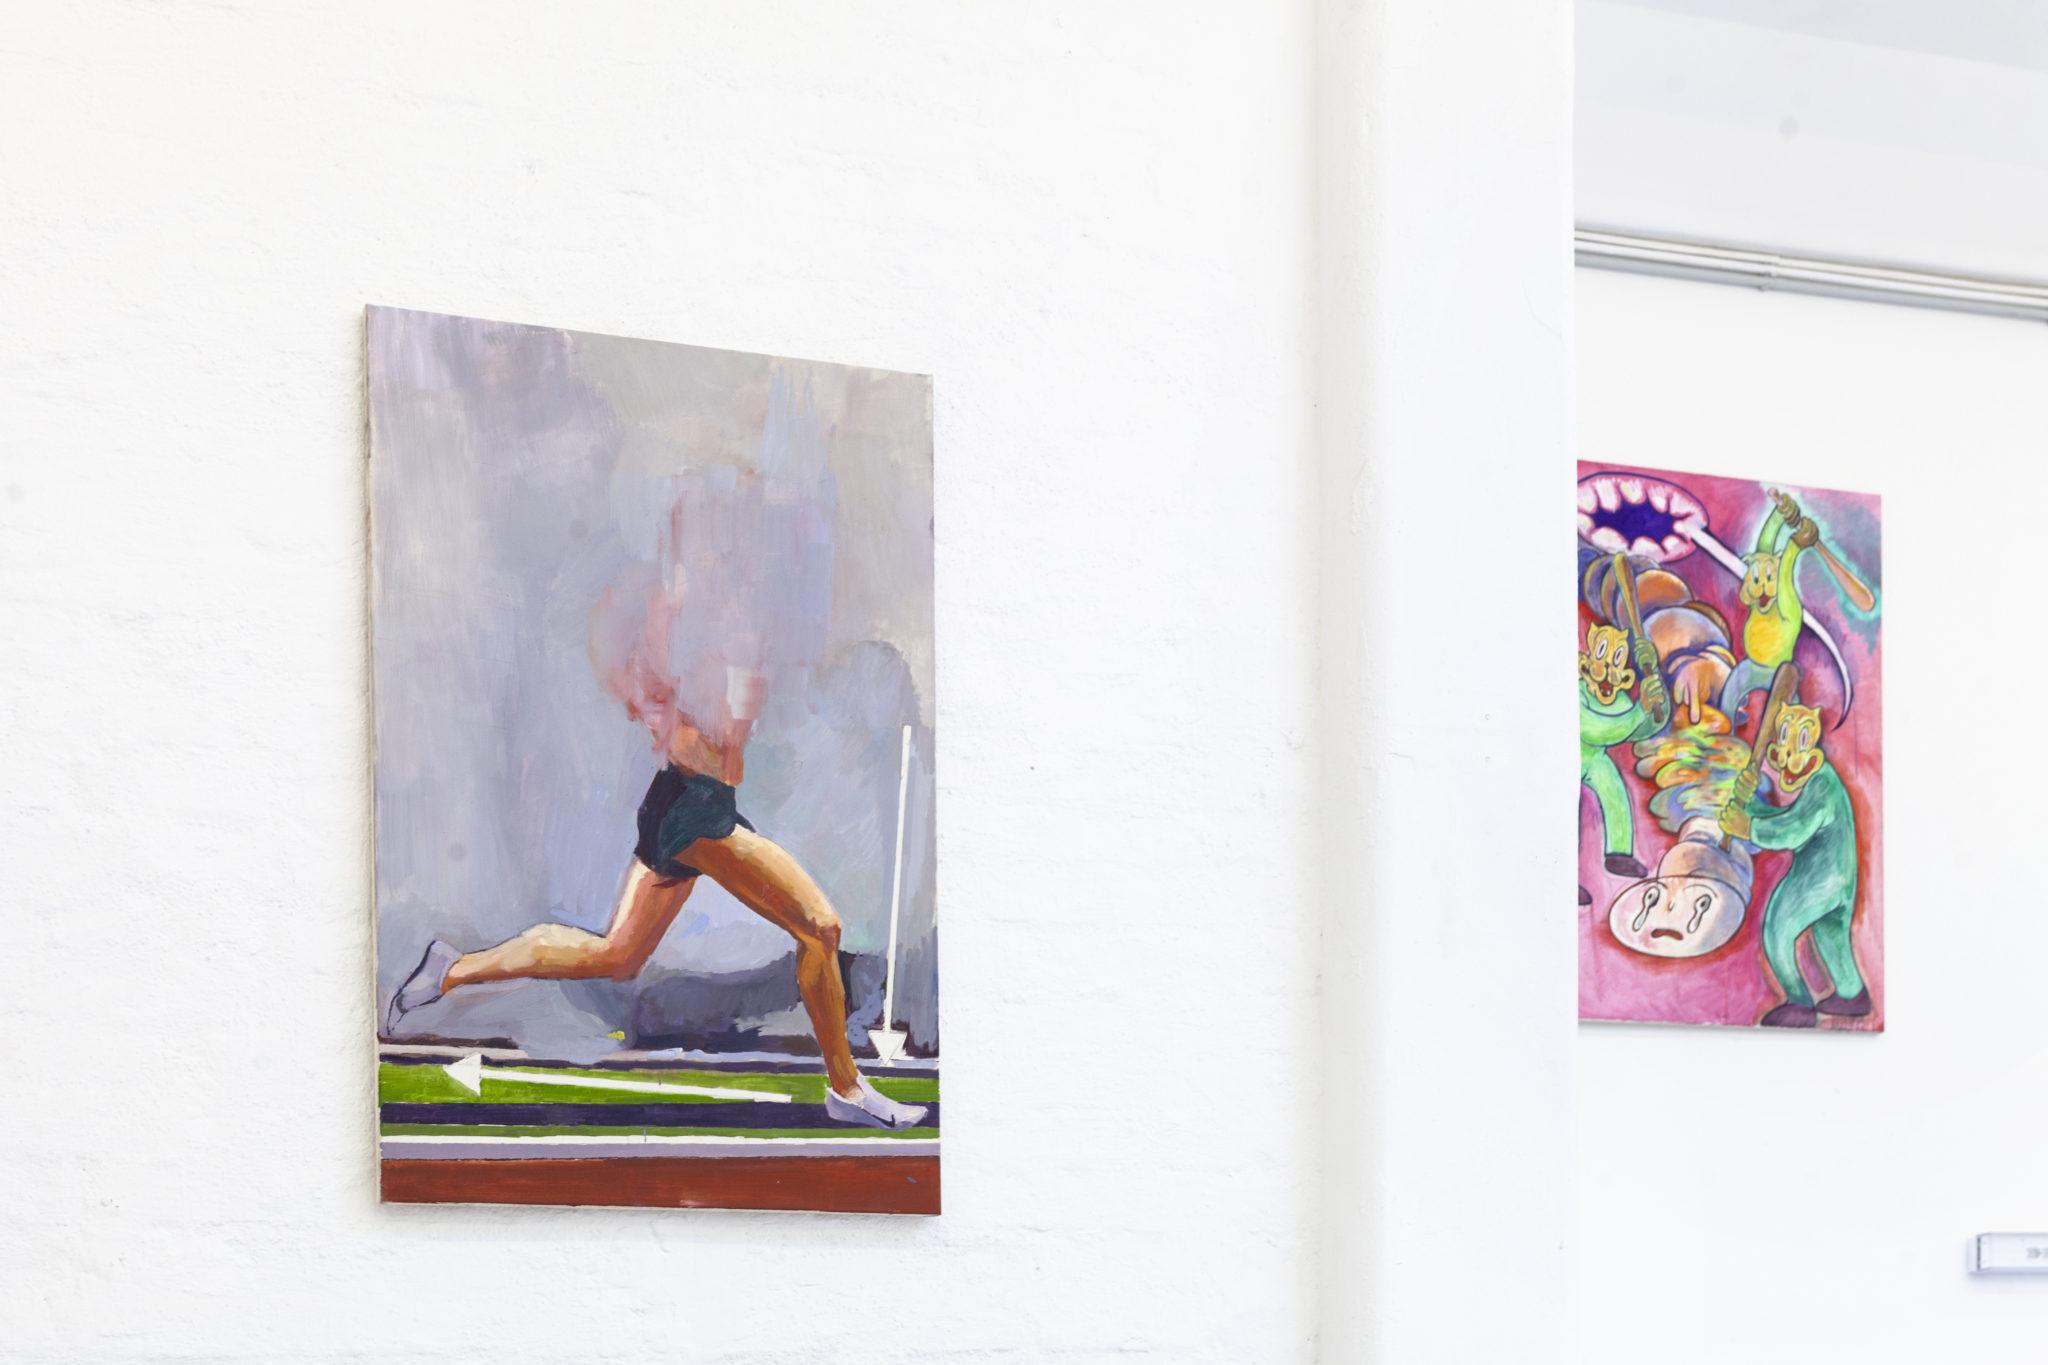 Bosse Bergfeld, How to run in proper form, Öl auf Leinwand, 120 x 80 cm, 2021_2